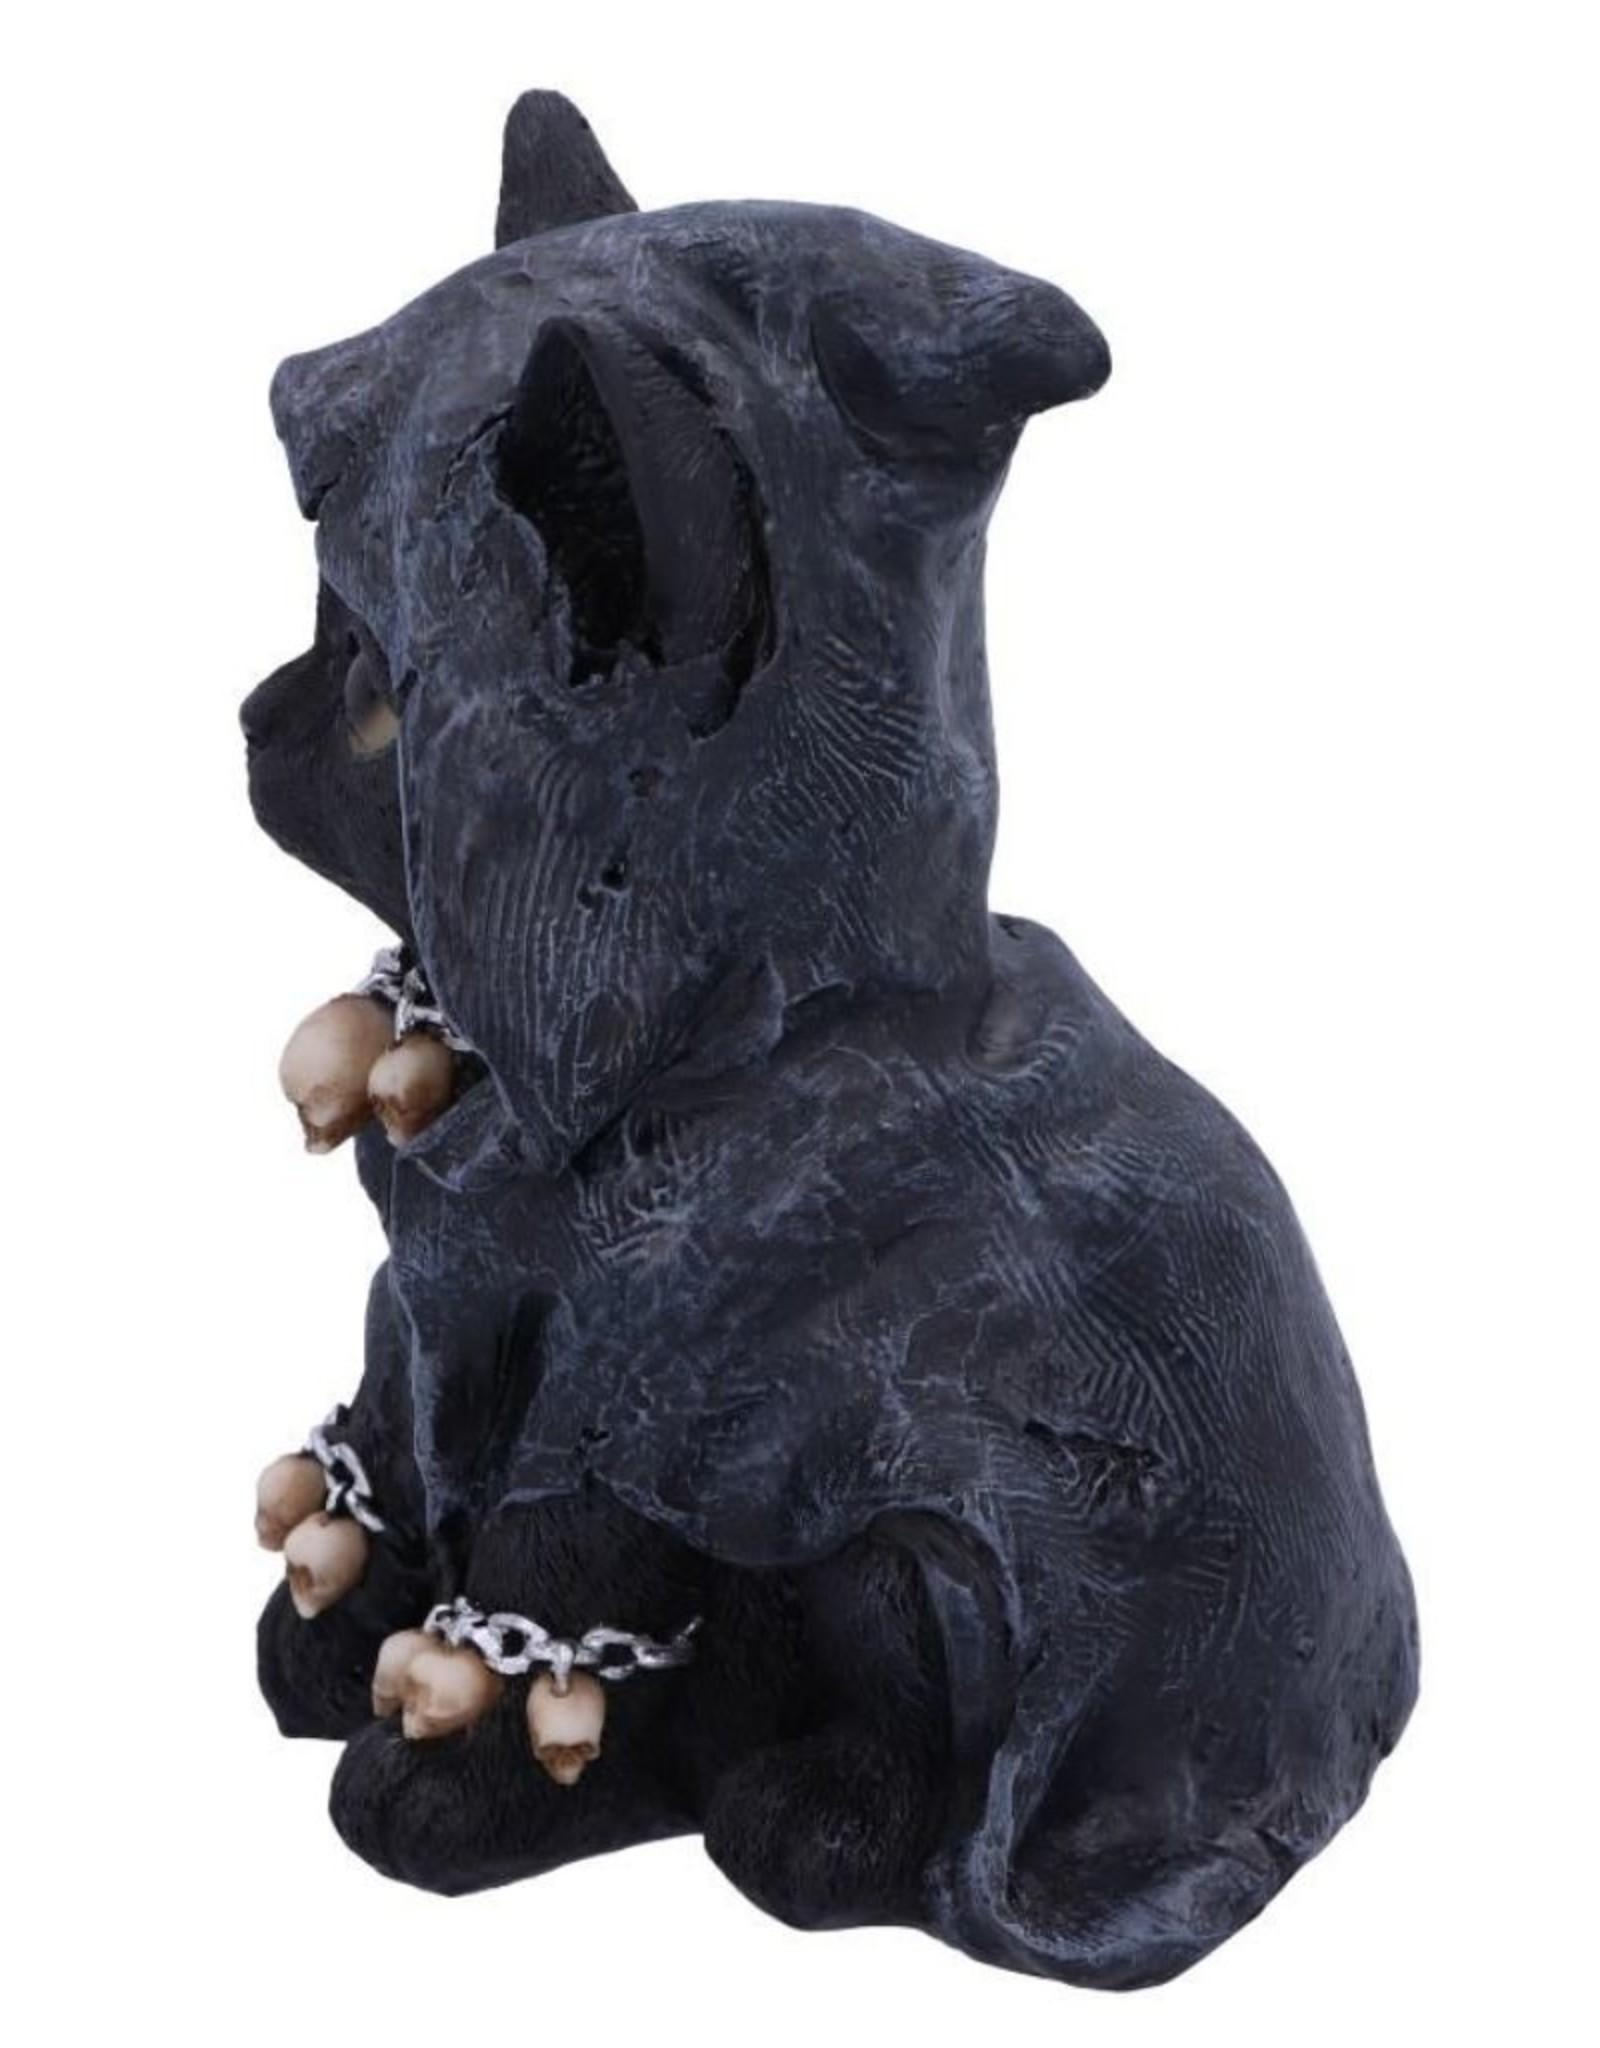 Alator Giftware and Figurines - Cat figurine Reapers Feline 16cm - Nemesis Now